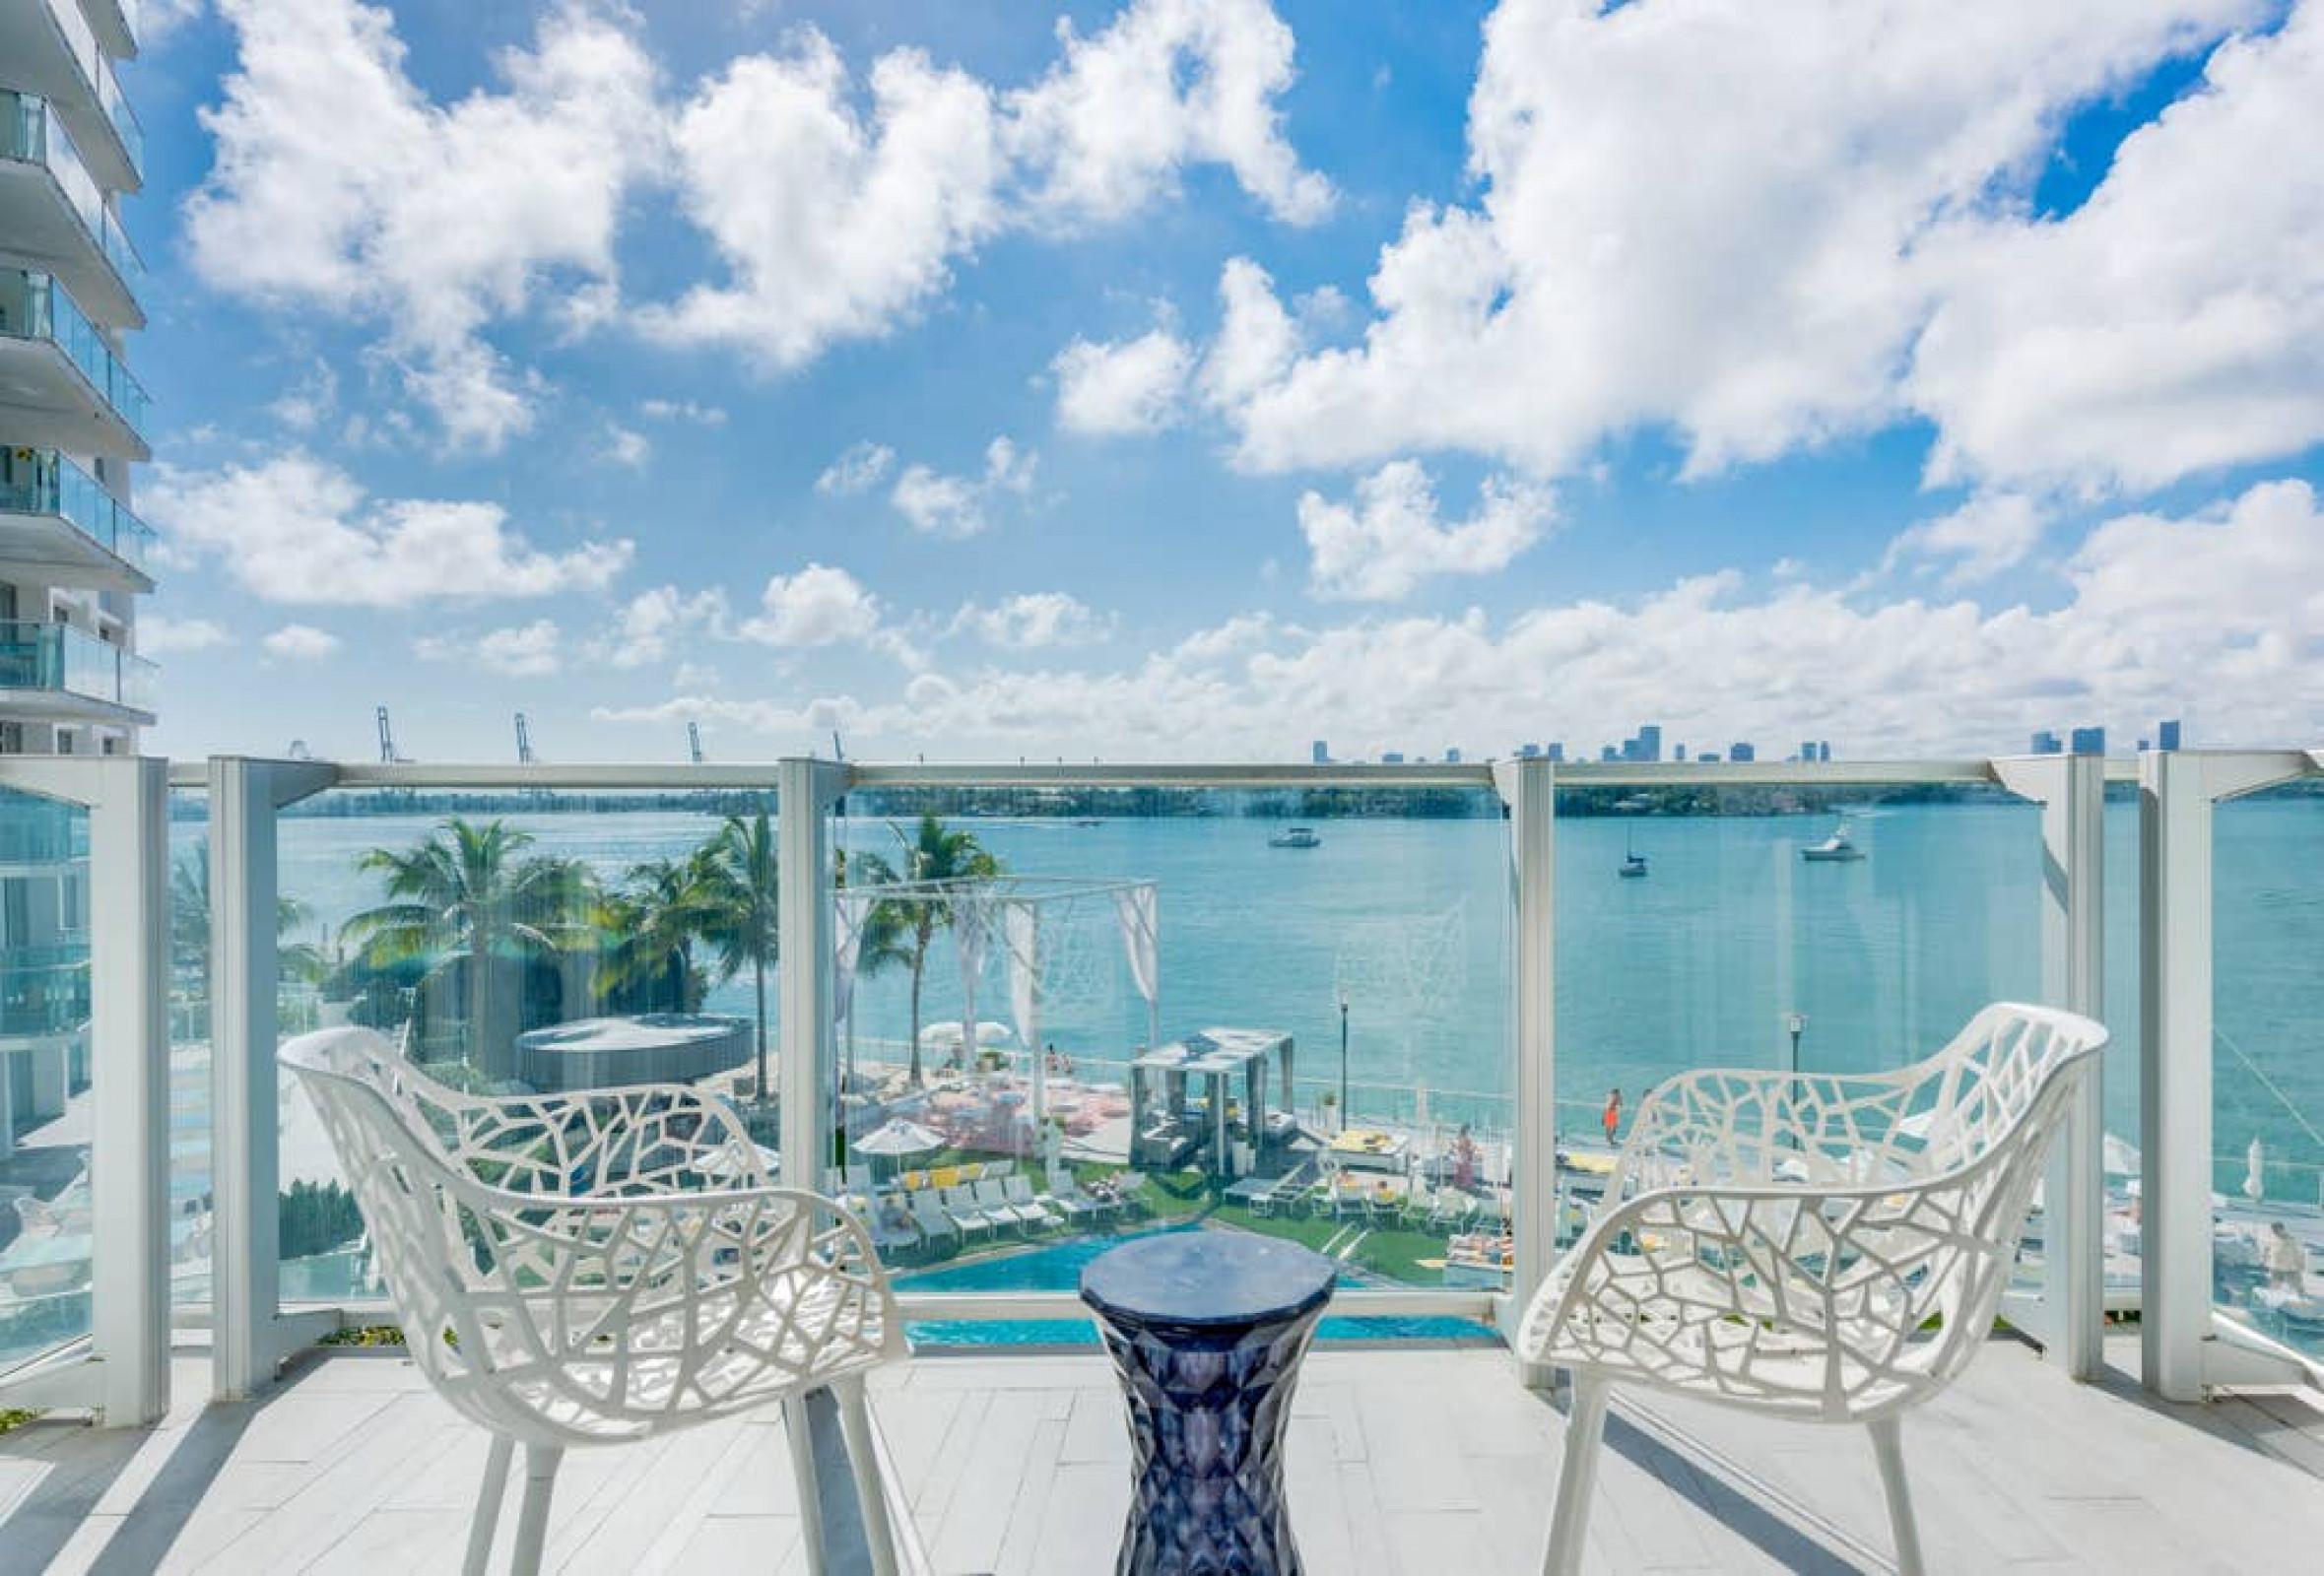 1100 West 410 · Balcony View, Sunset Pool,  24H Gym Spa Free WiFi